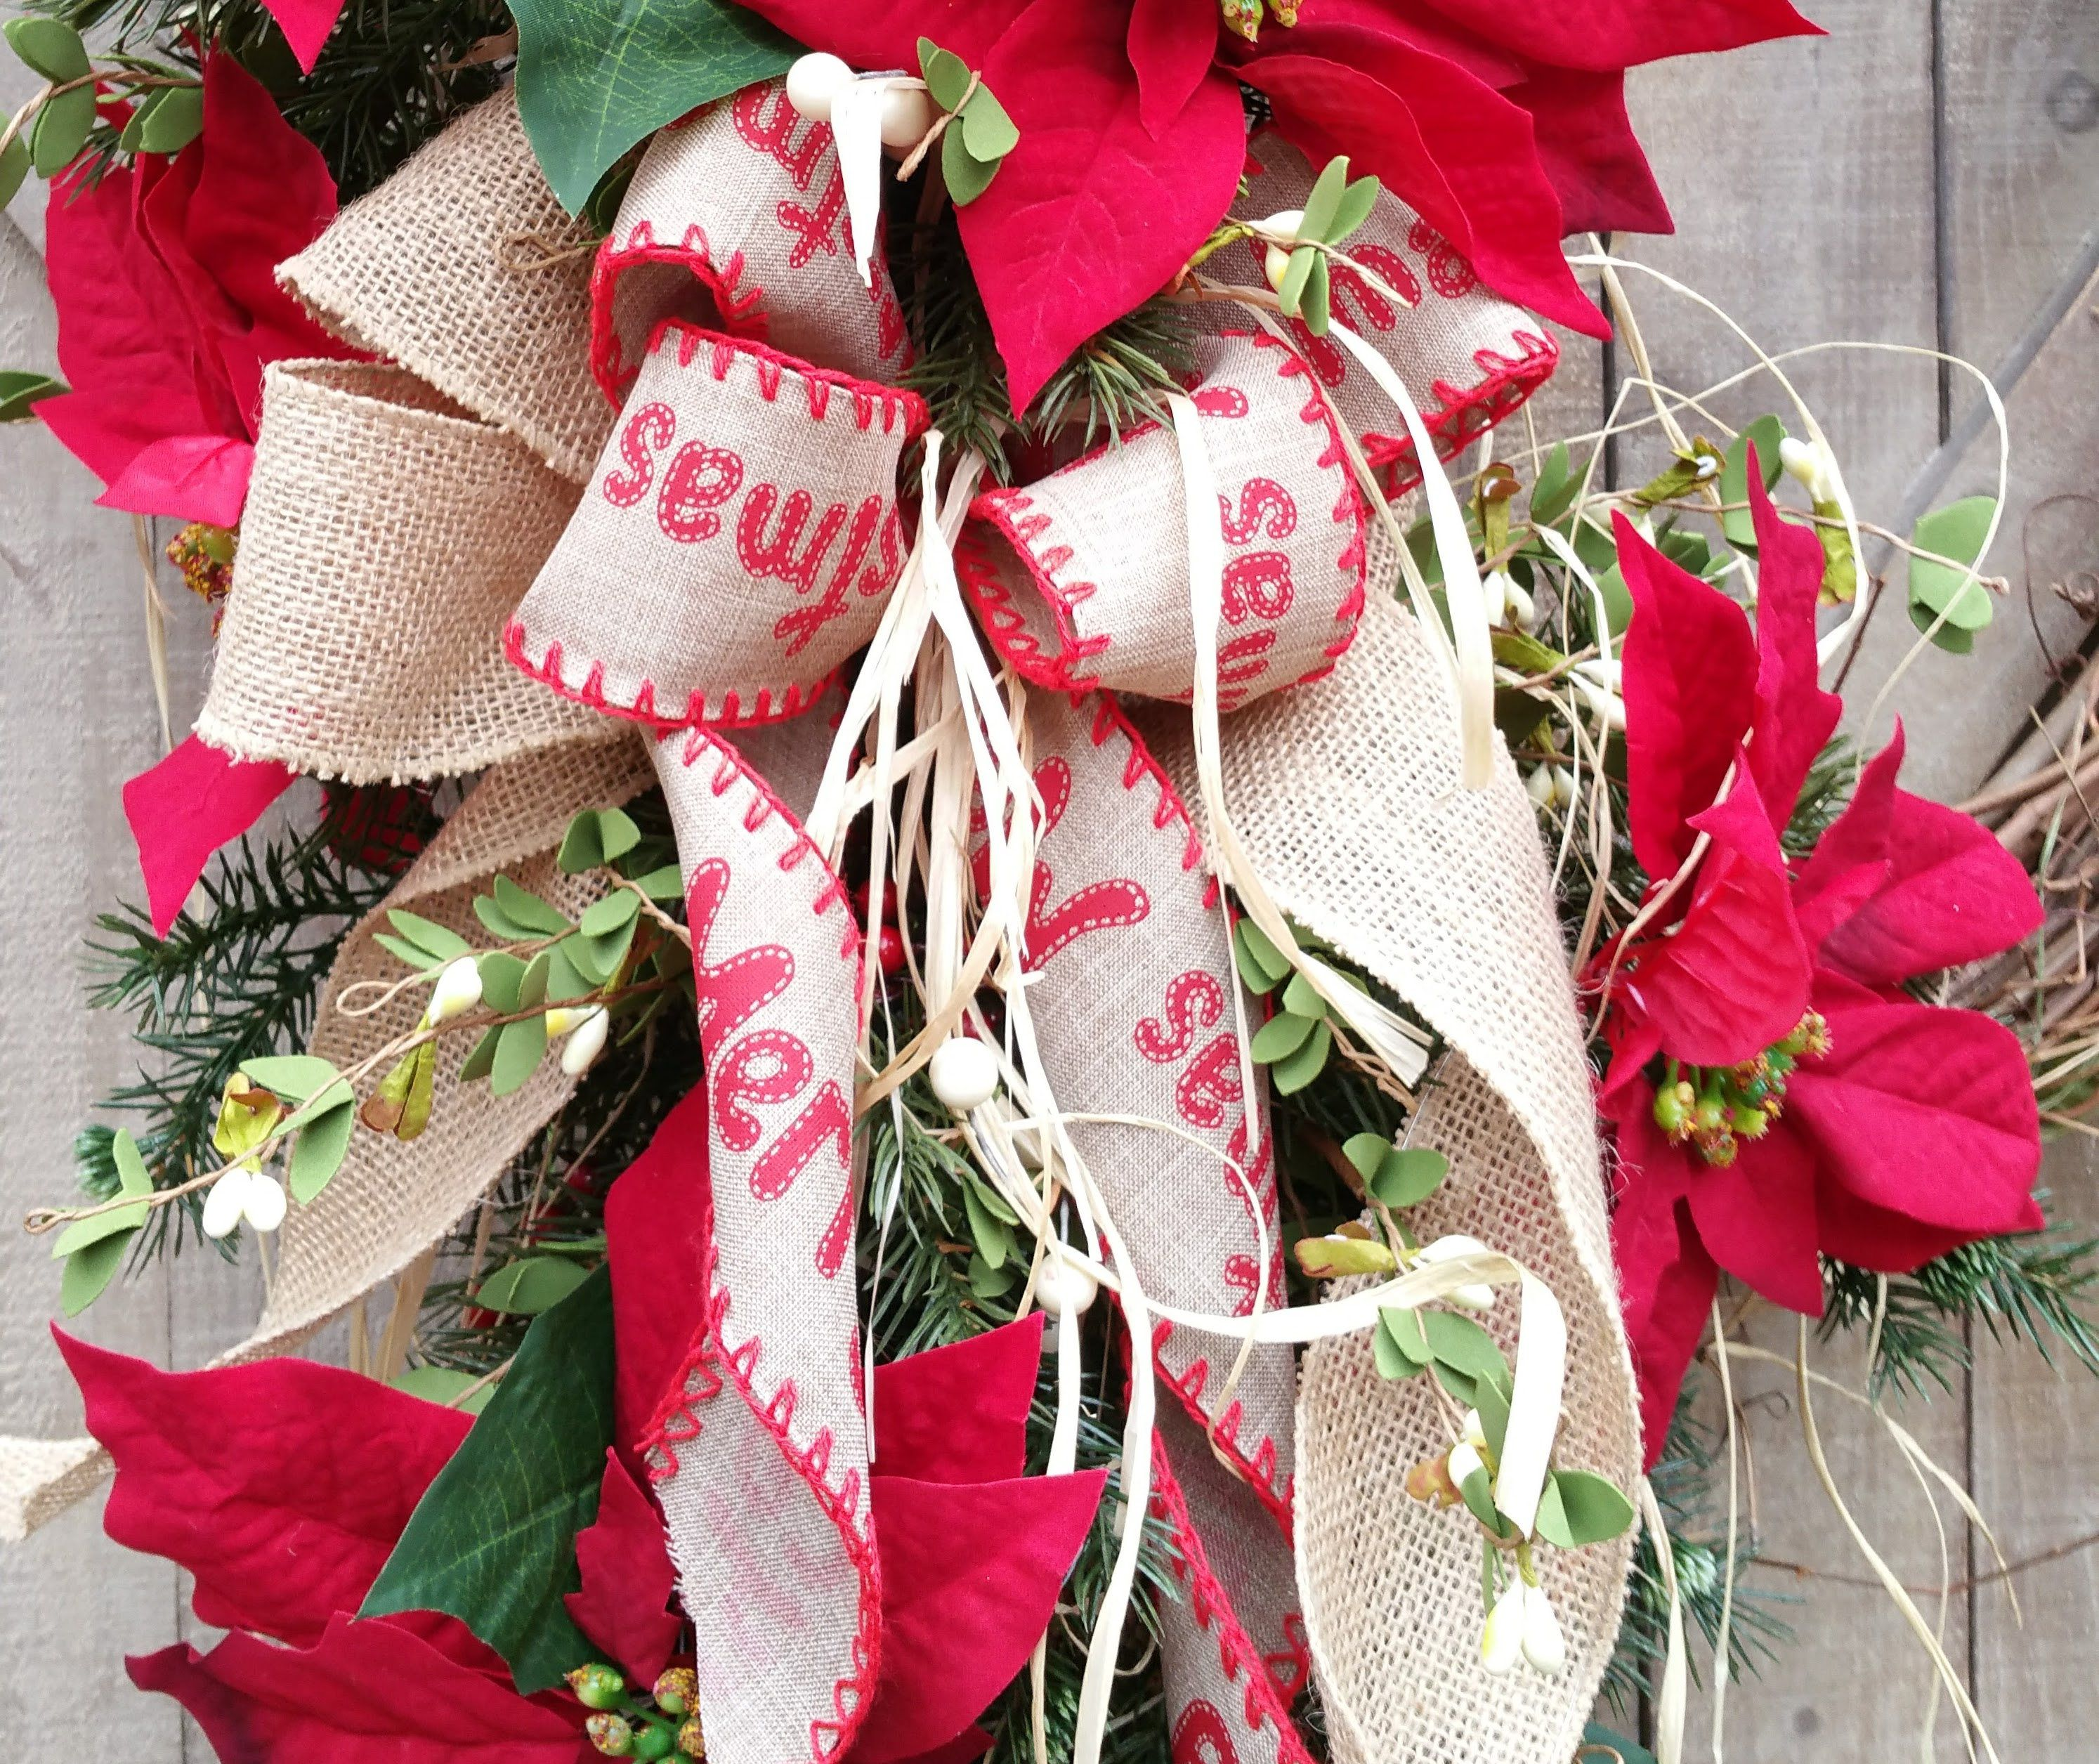 430 best Christmas Decor images on Pinterest in 2018